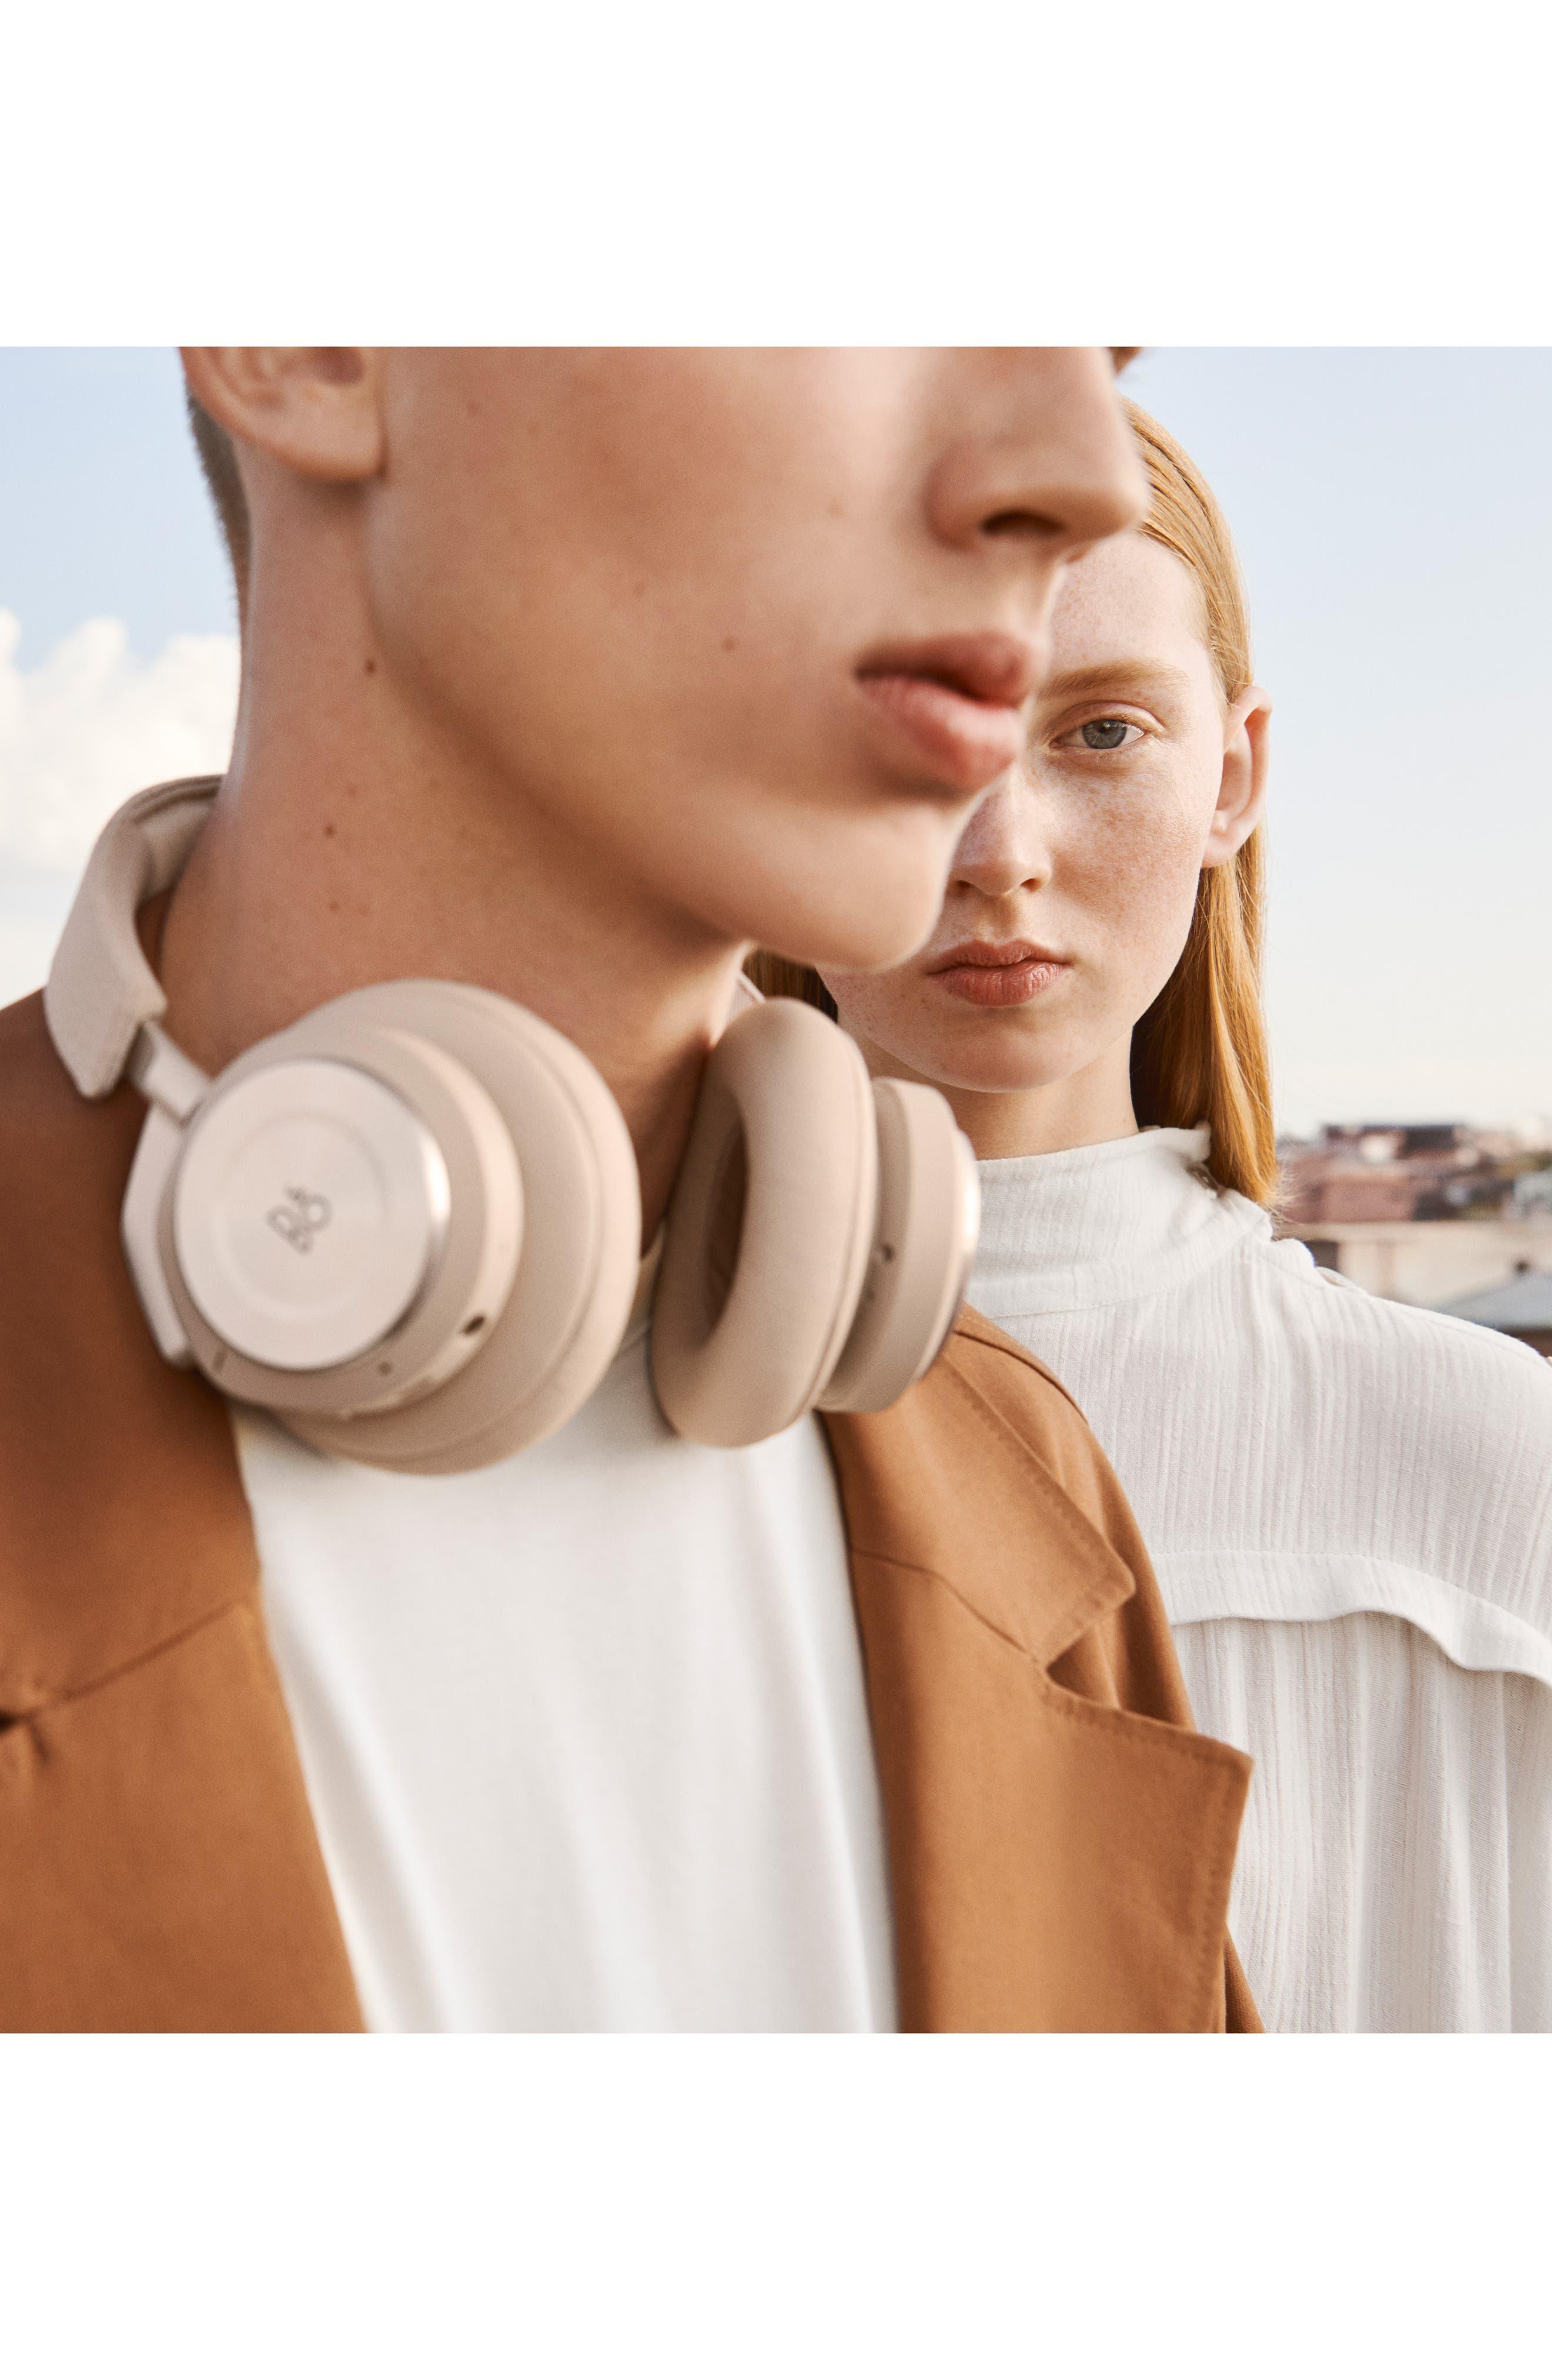 H9I Wireless Noise Canceling On-Ear Headphones,                             Alternate thumbnail 4, color,                             LIMESTONE